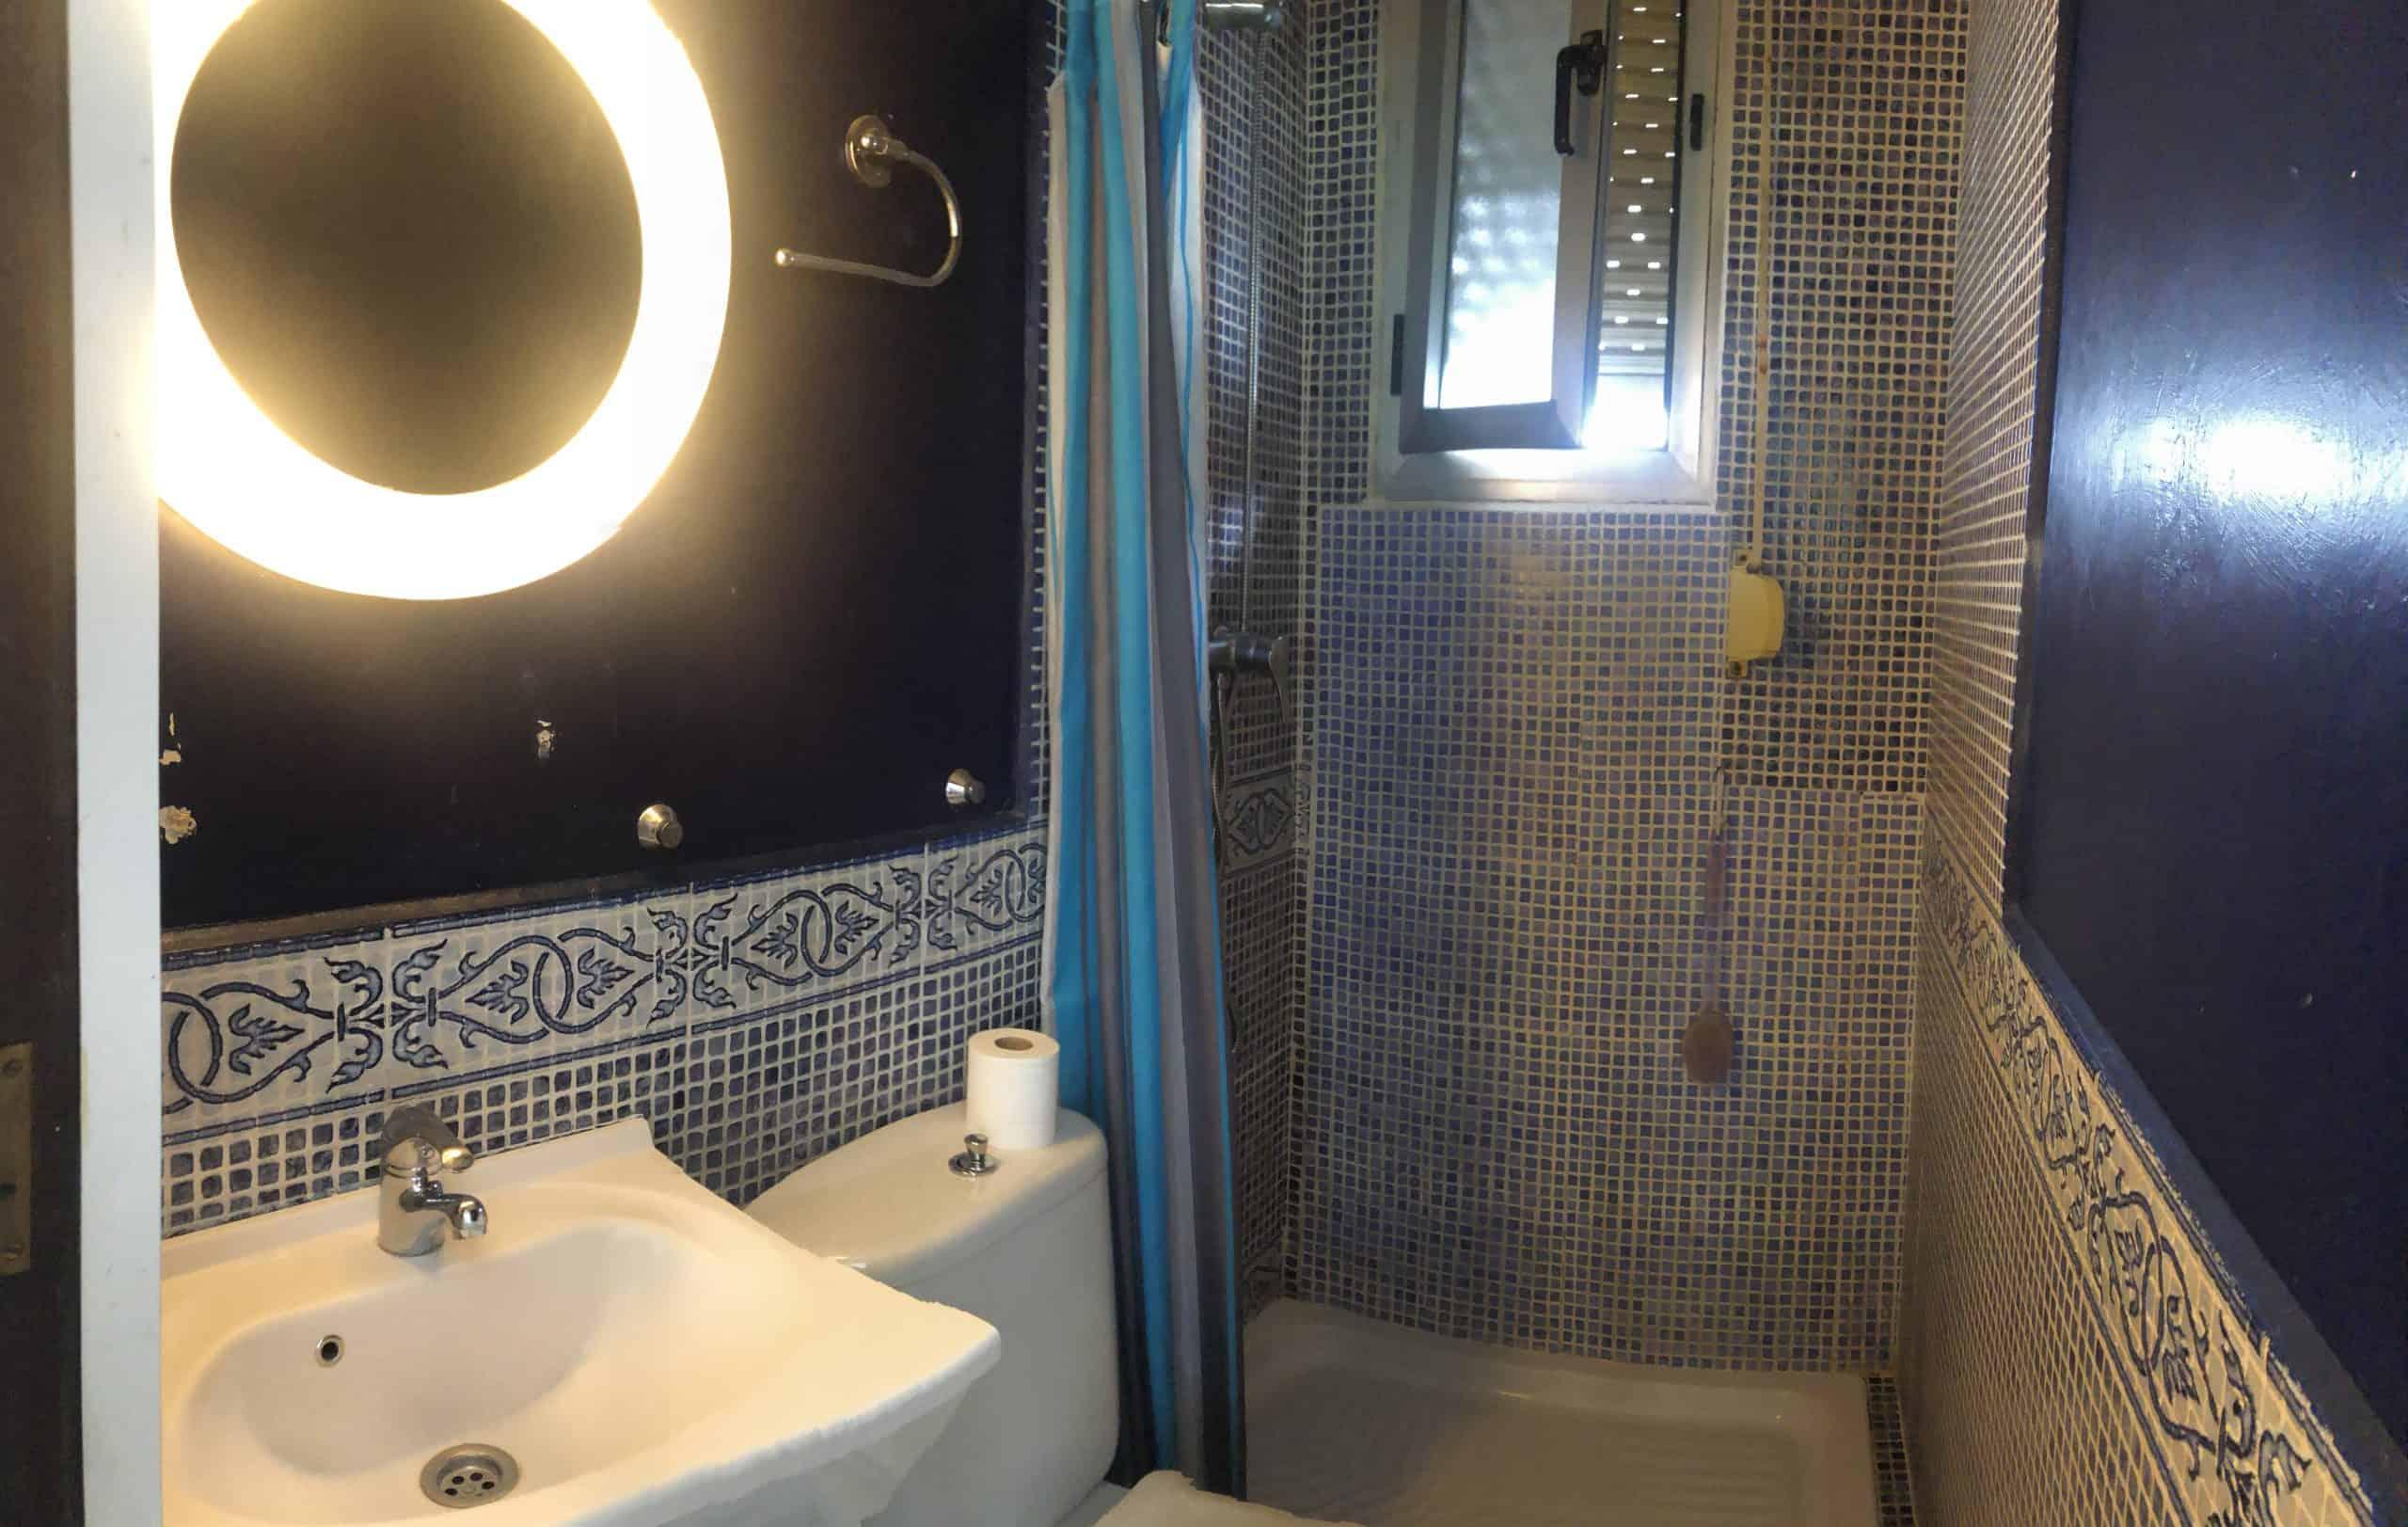 Agencia Inmobiliaria de Madrid-FUTUROCASA-Zona ARGANZUELA-EMBAJADORES-LEGAZPI -calle Embajadores- baño- 3